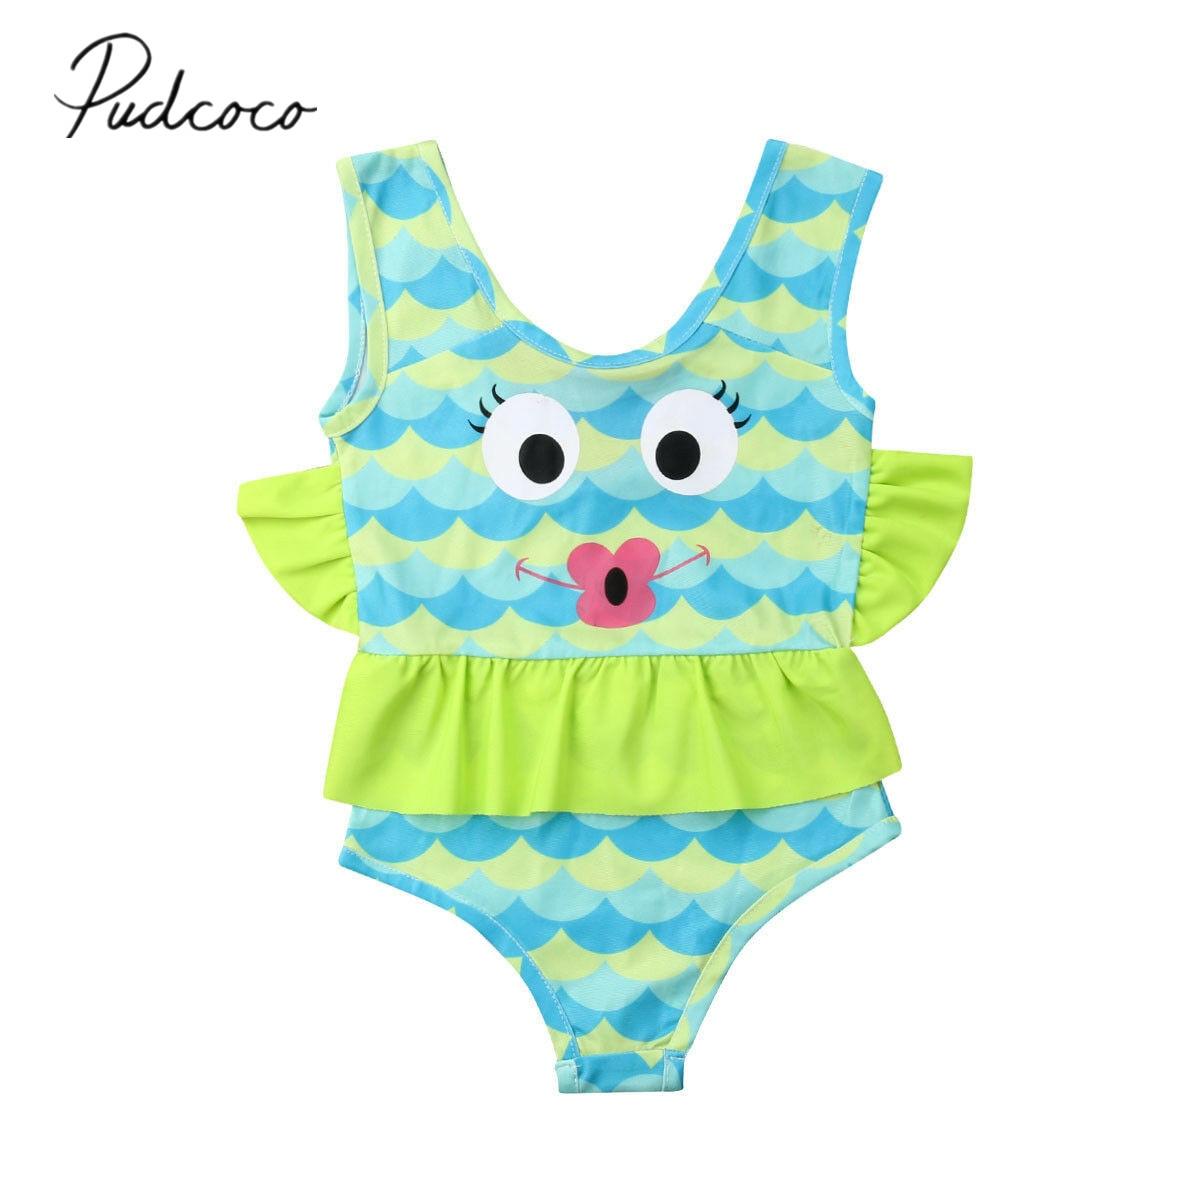 43a4b01ad8ee4 Detail Feedback Questions about 2019 Brand New Toddler Kid Baby Girl Fish  Tankini One Piece Ruffled Cotton Bikini Swimwear Swimsuit Bathing Suit  Beachwear ...